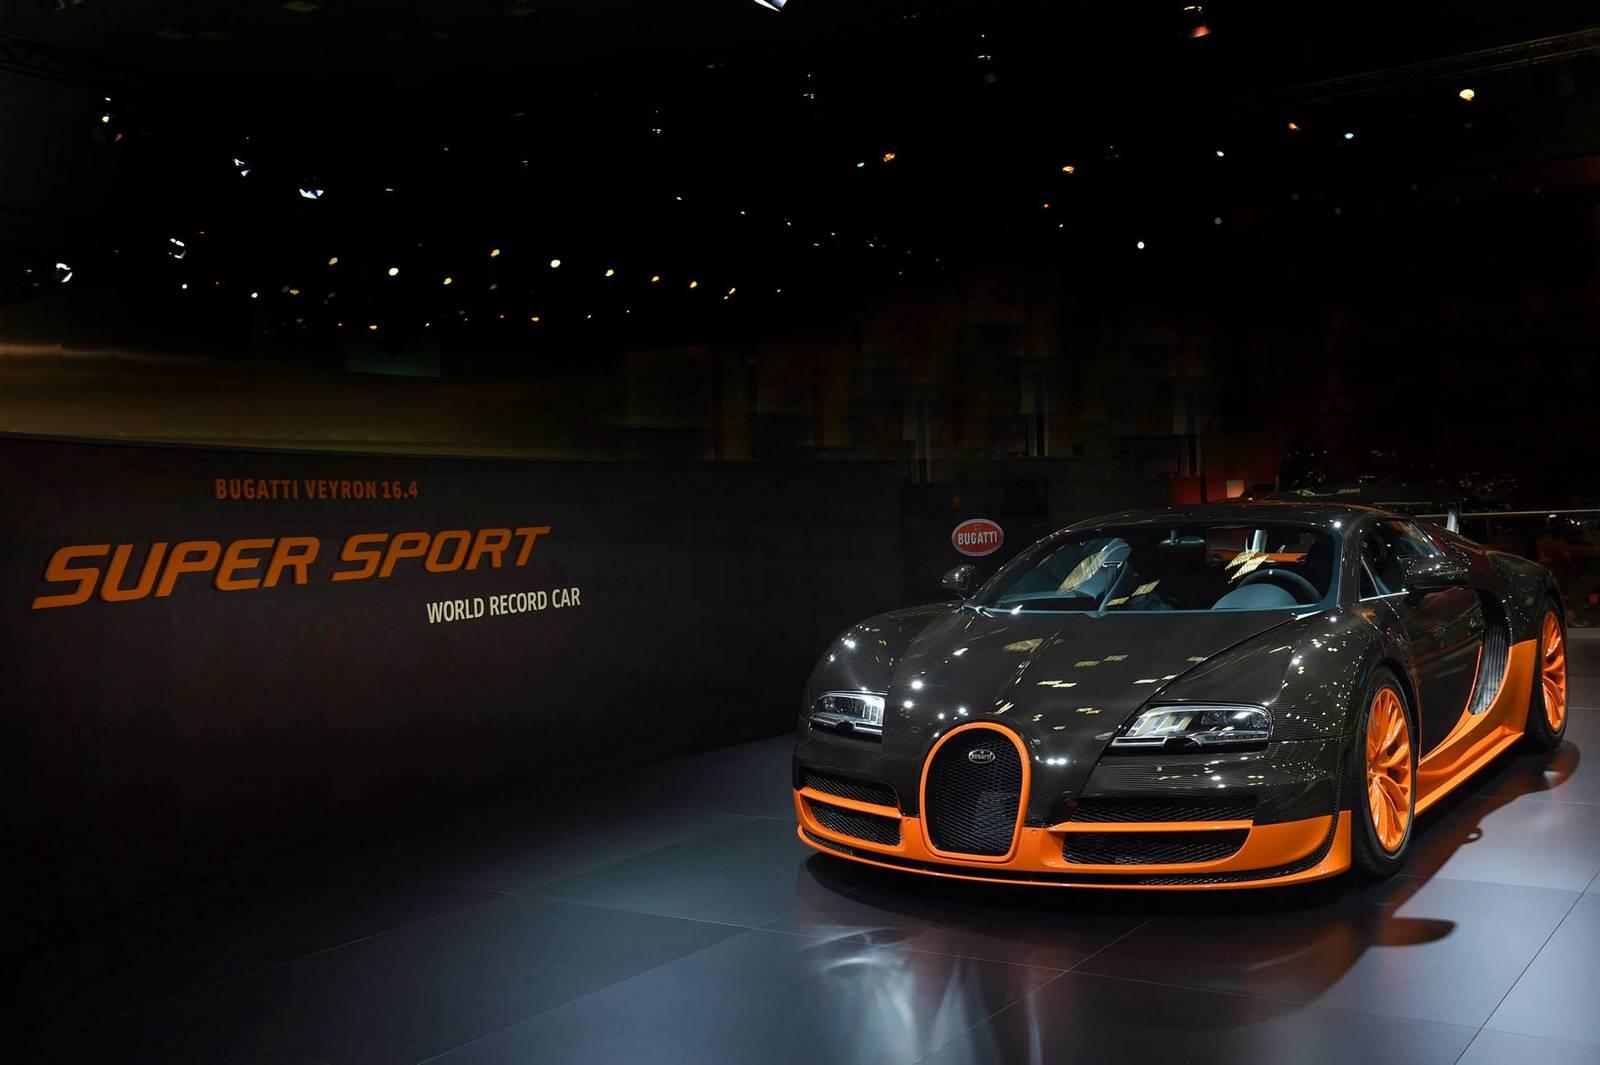 bugatti veyron super sport wrc stars at qatar motor show gtspirit. Black Bedroom Furniture Sets. Home Design Ideas